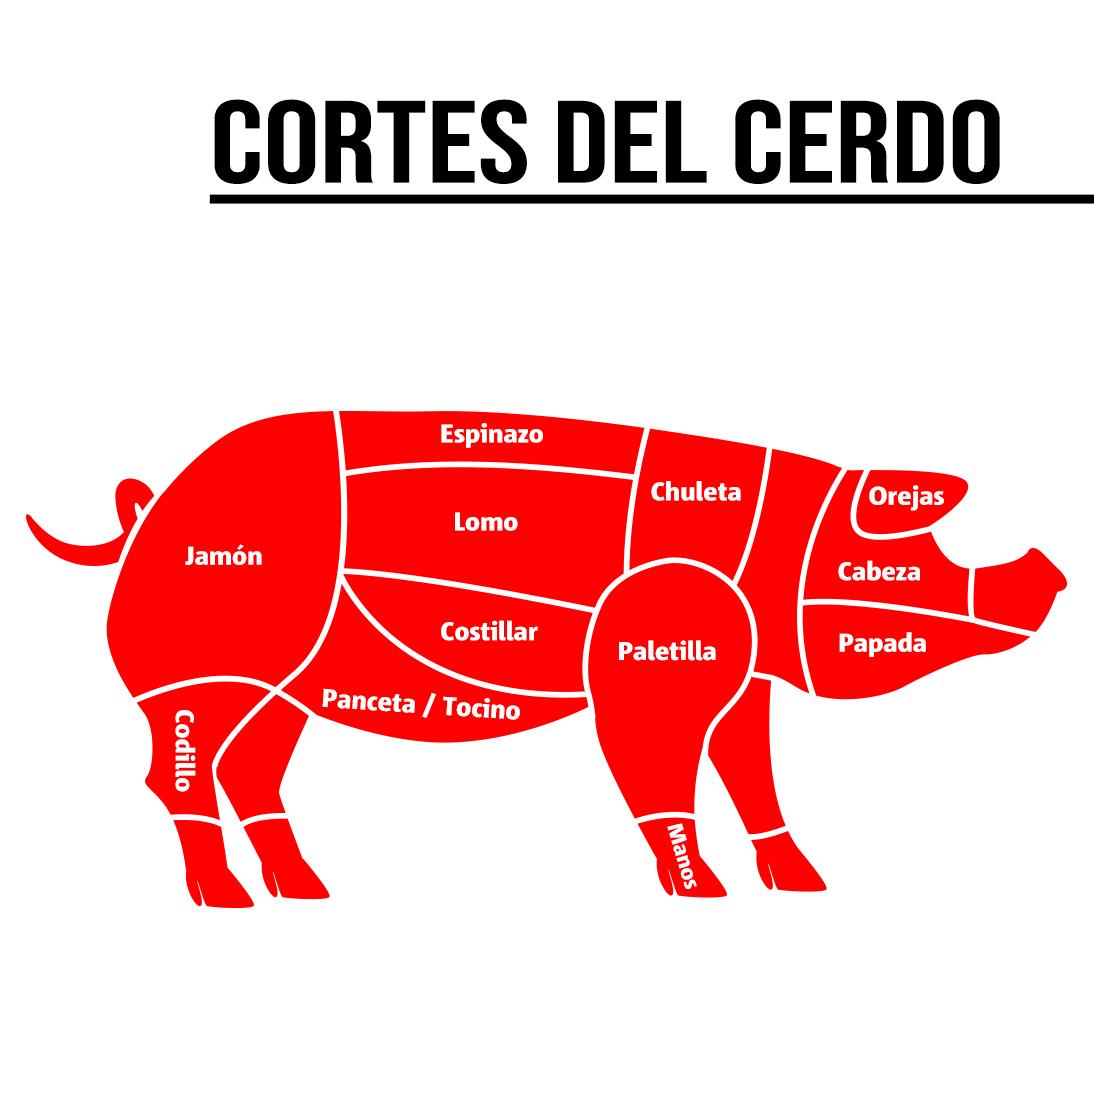 https://0201.nccdn.net/1_2/000/000/0ea/426/cortes-cerdo.jpg